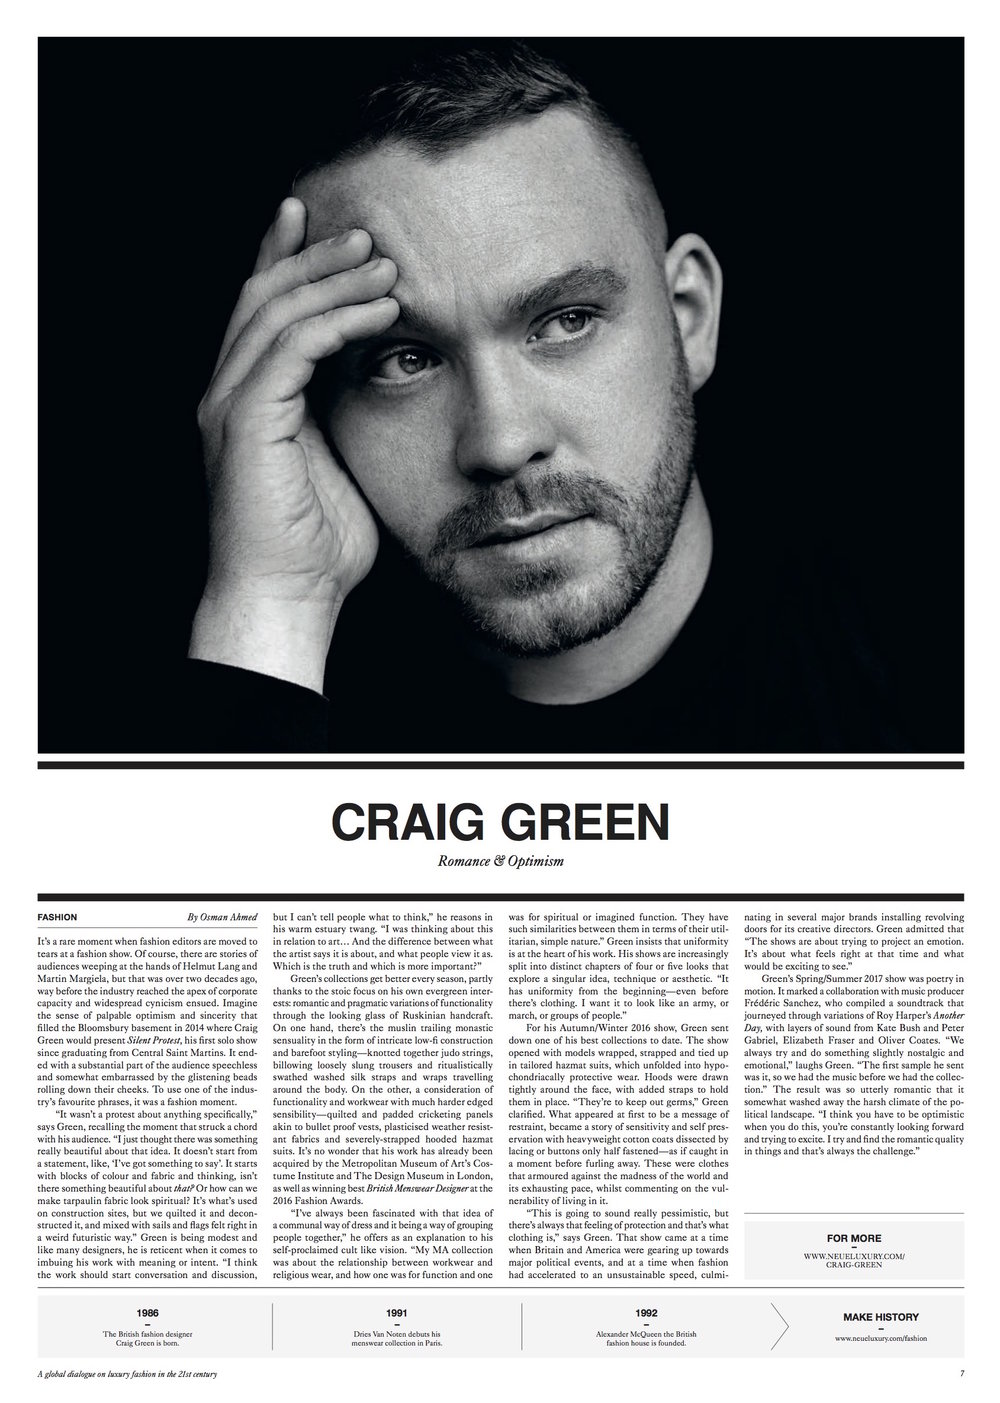 Craig Green profile